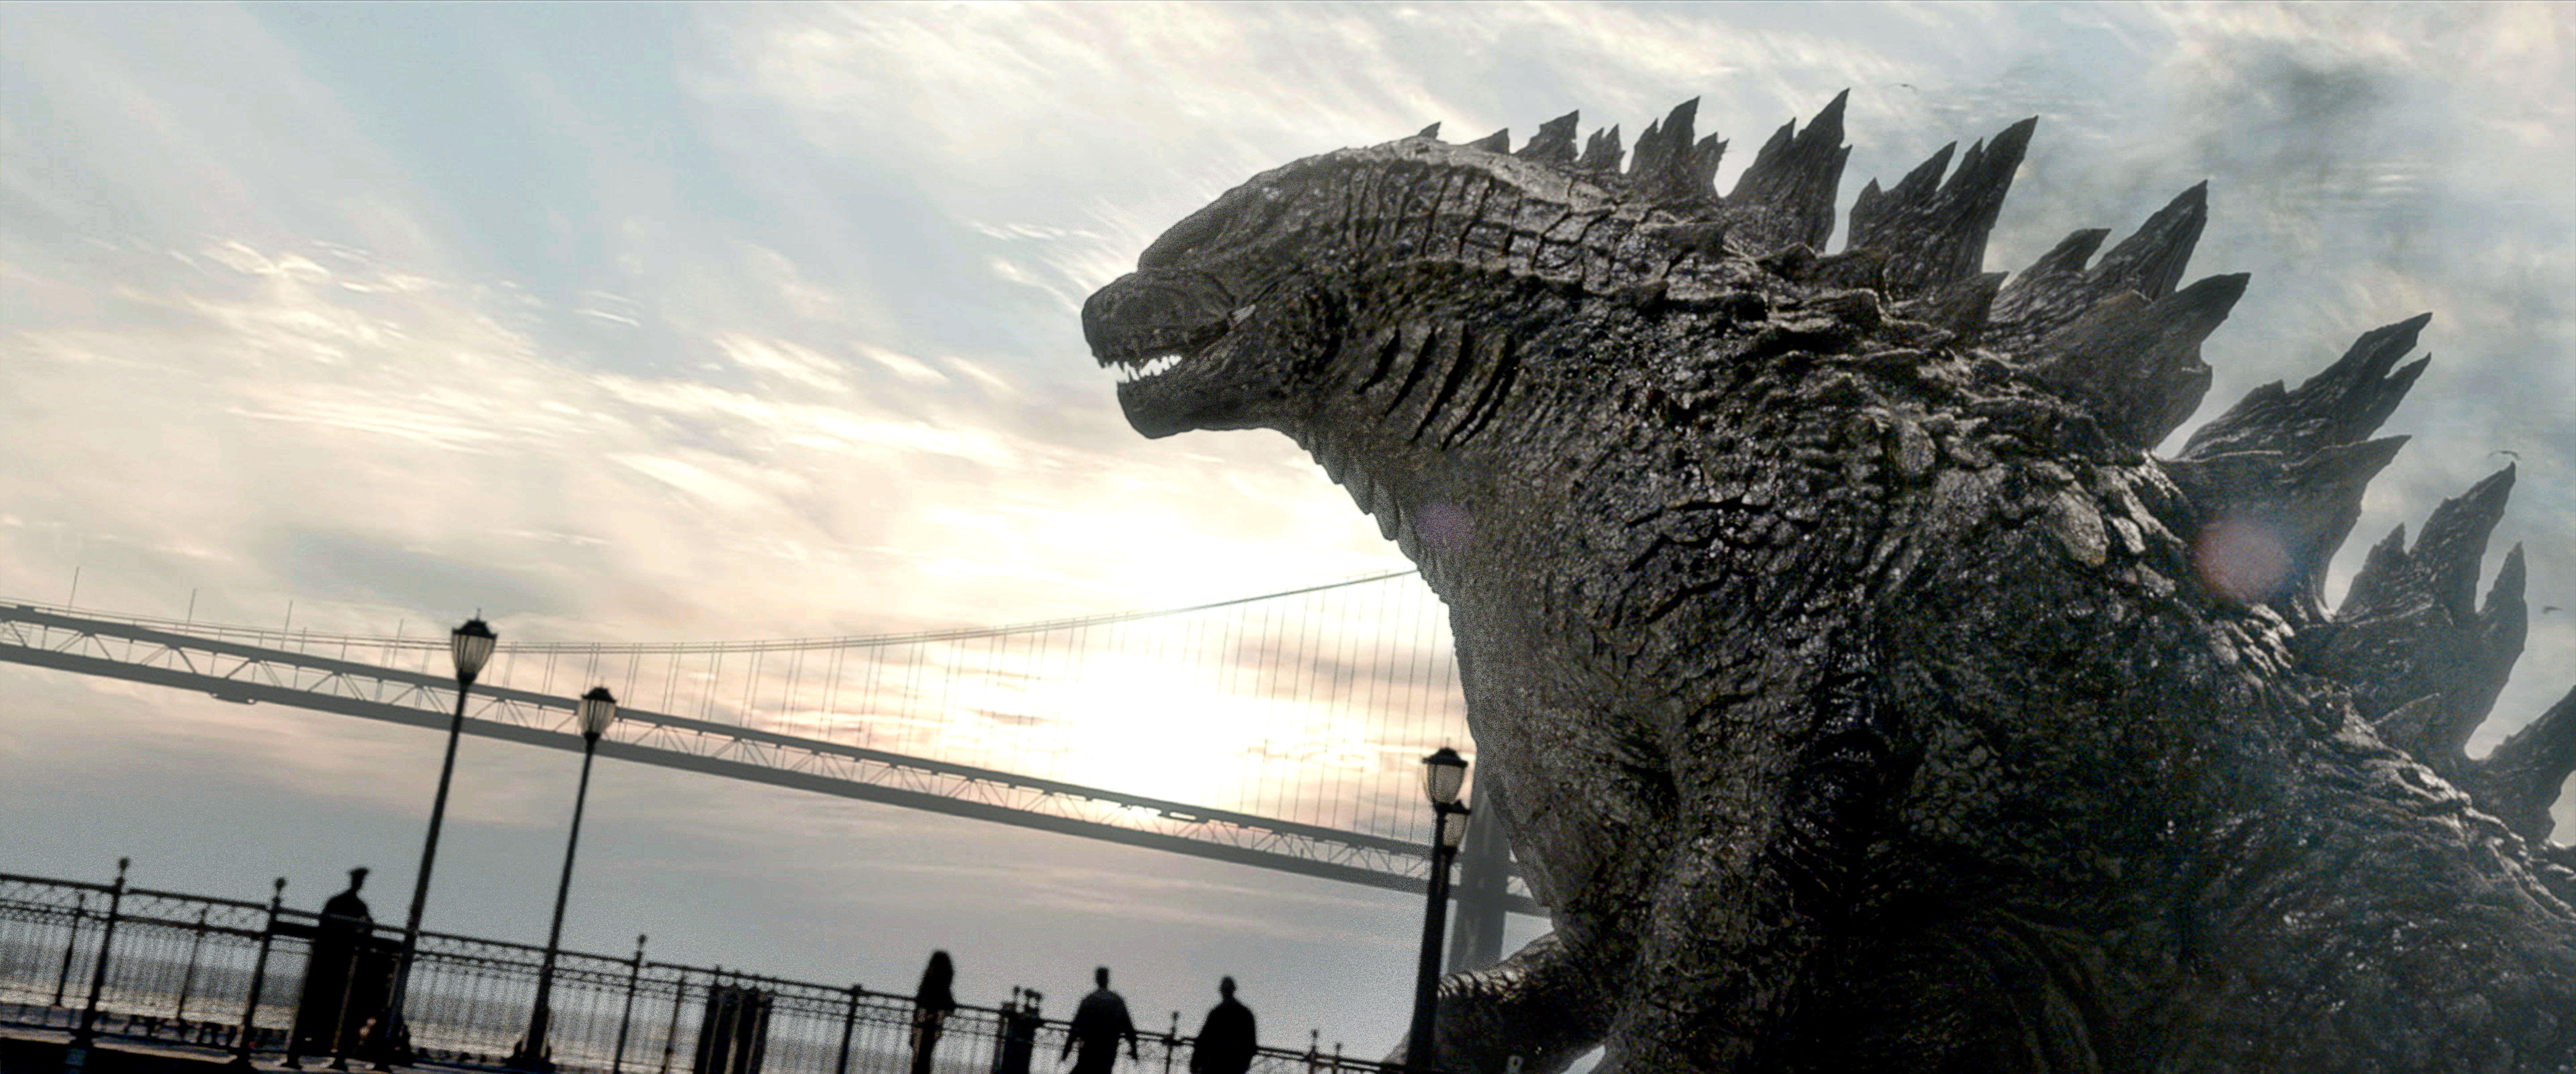 Godzilla (2014) - HD 写真